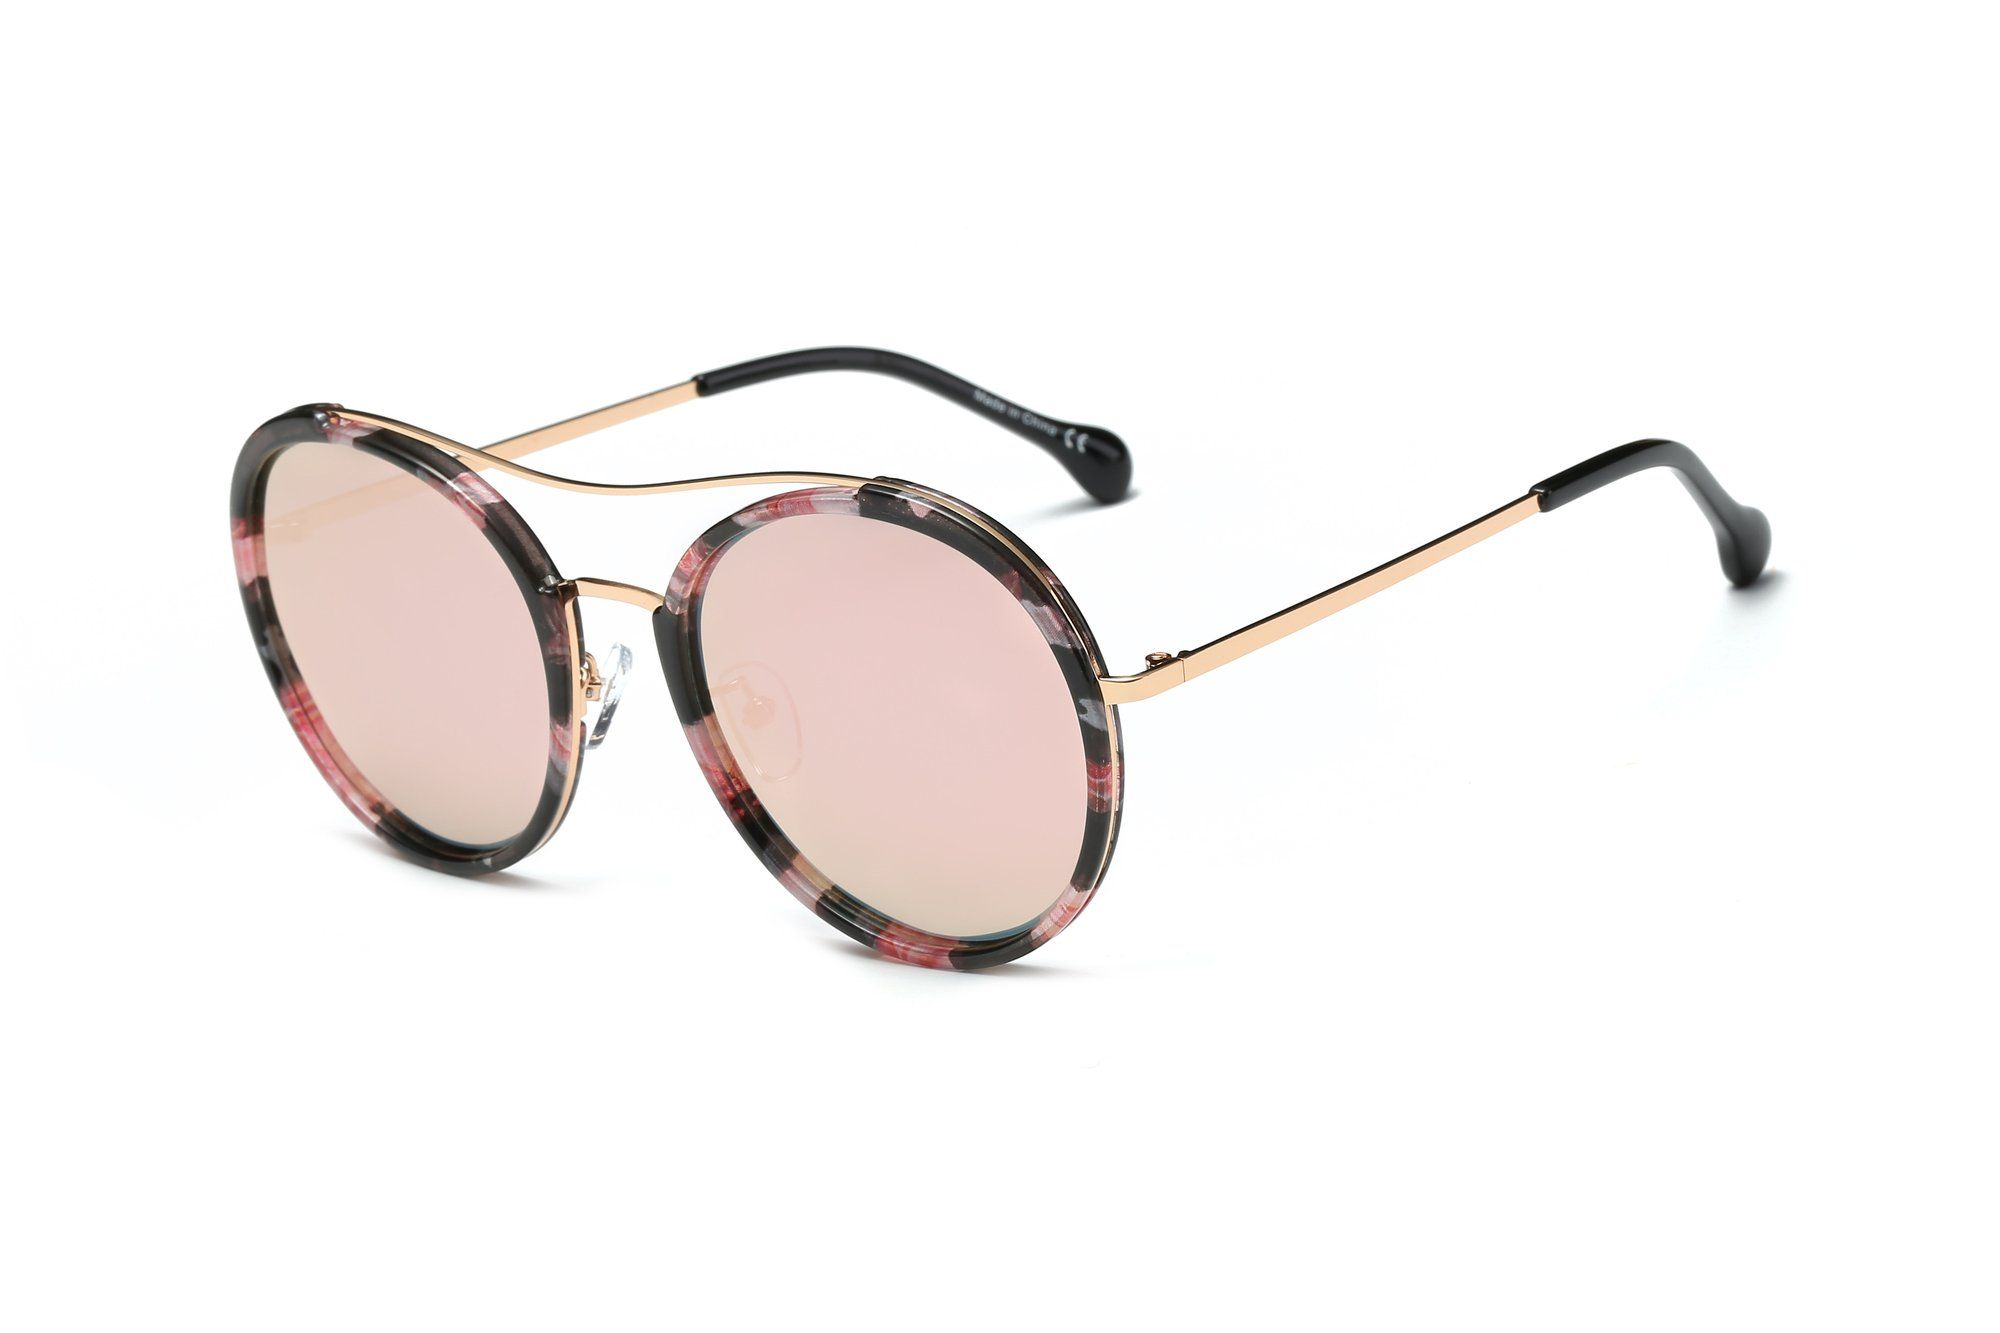 Men's Sunglasses New Design Brand Logo Men Sunglasses Women Candy Novelties Buffalo Horn Glasses Classic Gafas De Sol Goggles Processing Cheapest Price From Our Site